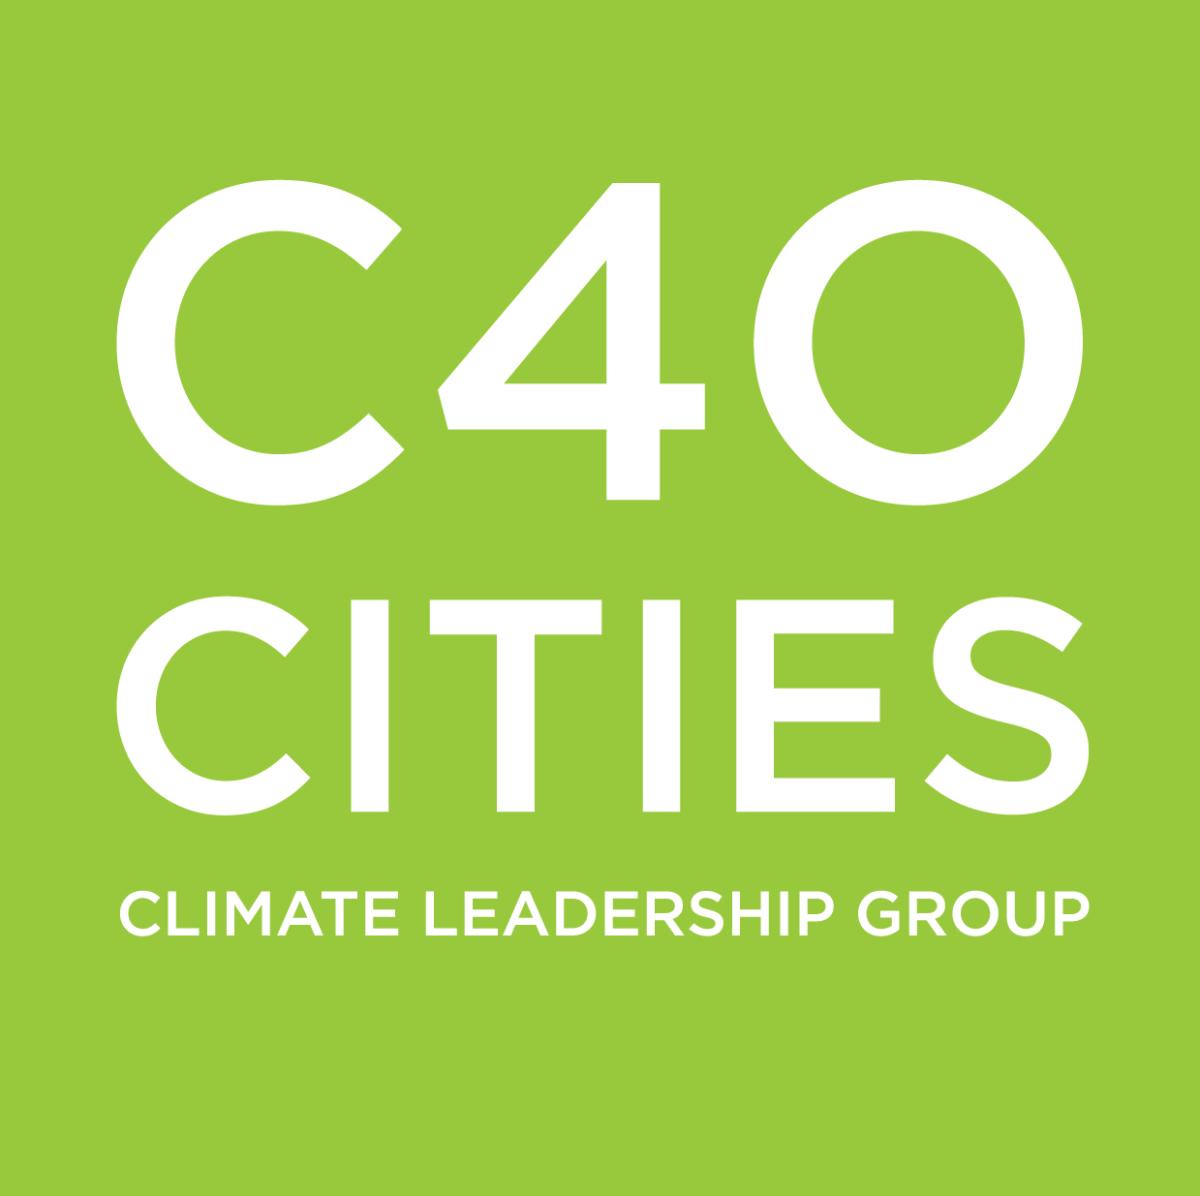 Stéphane Villecroze participates at the C40 Divest/Invest Forum at London's City Hall on March 20th